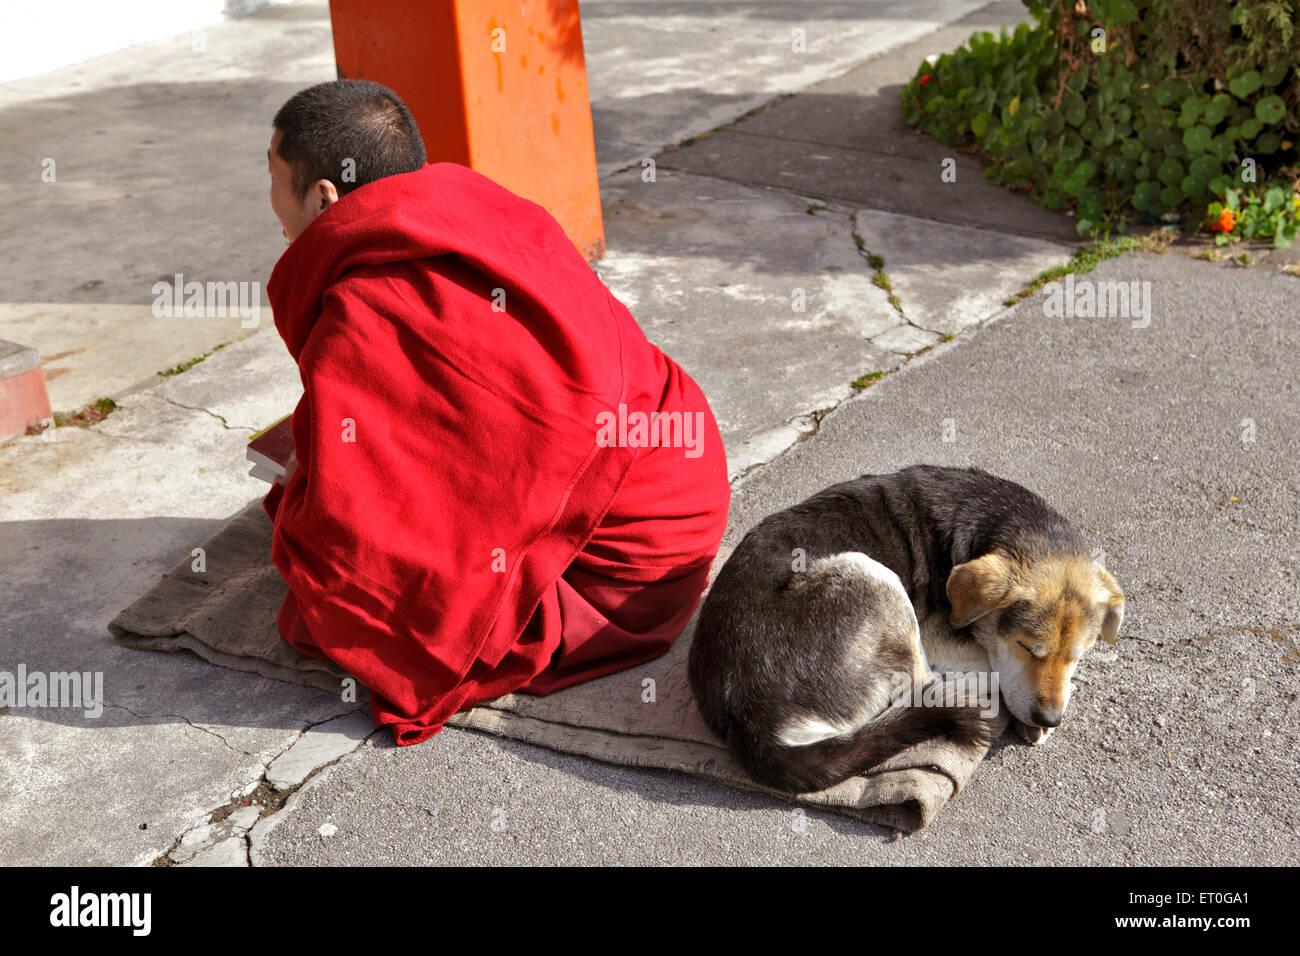 Dog sleep behind monk reading scriptures ; Happy valley ; Mussoorie ; Dehradun ; Uttaranchal Uttarakhand ; India - Stock Image